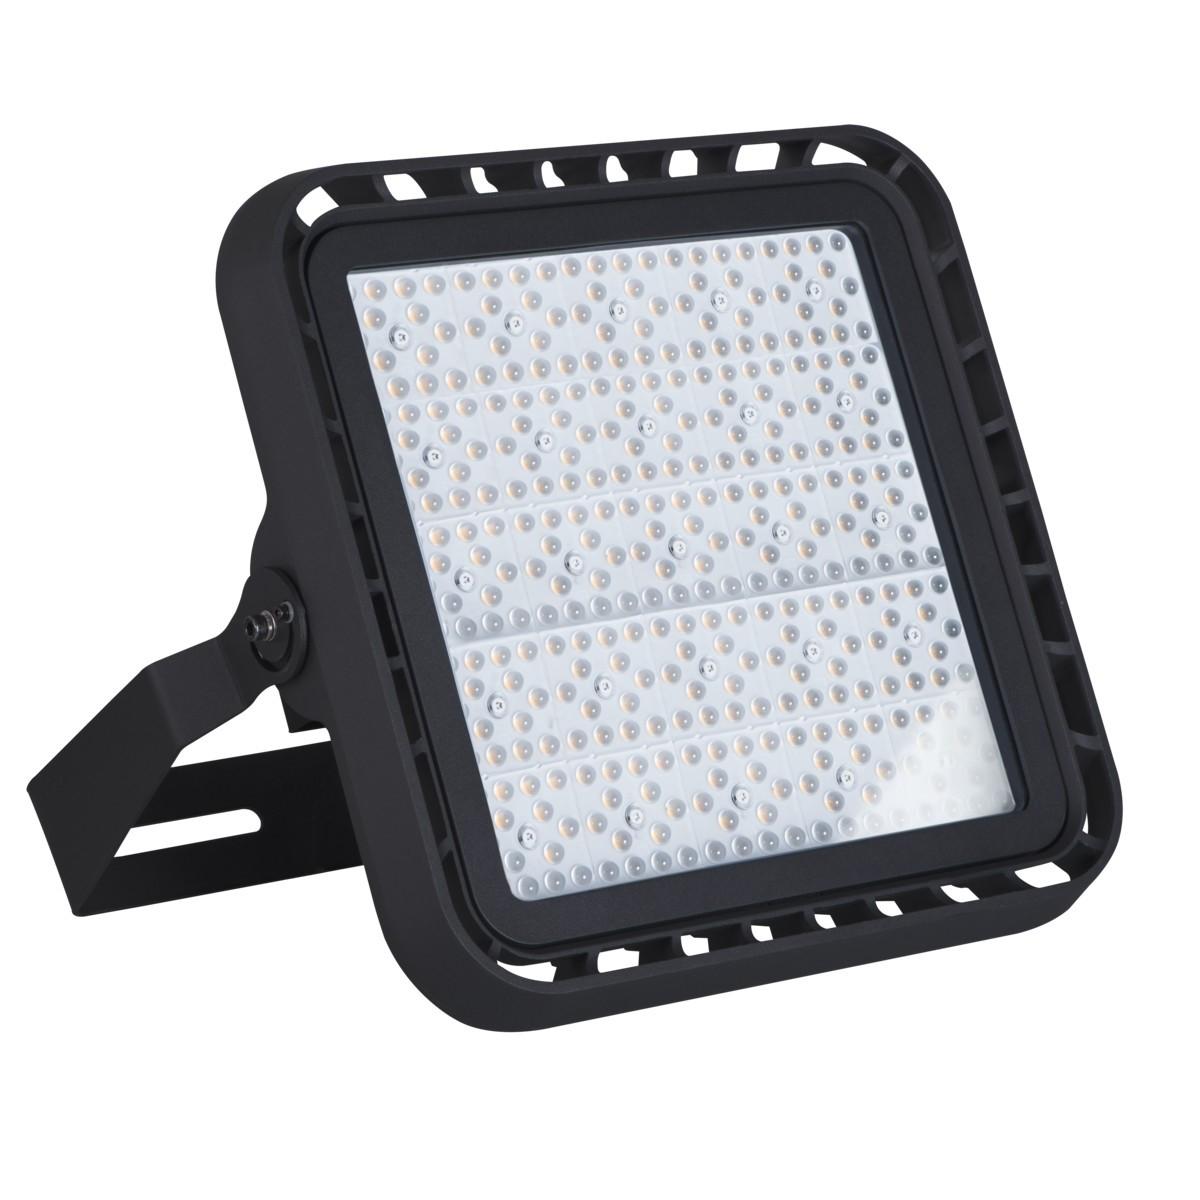 Kanlux FLM LED 220W-NW-60D 4000 Kelvin schwarz  IP65